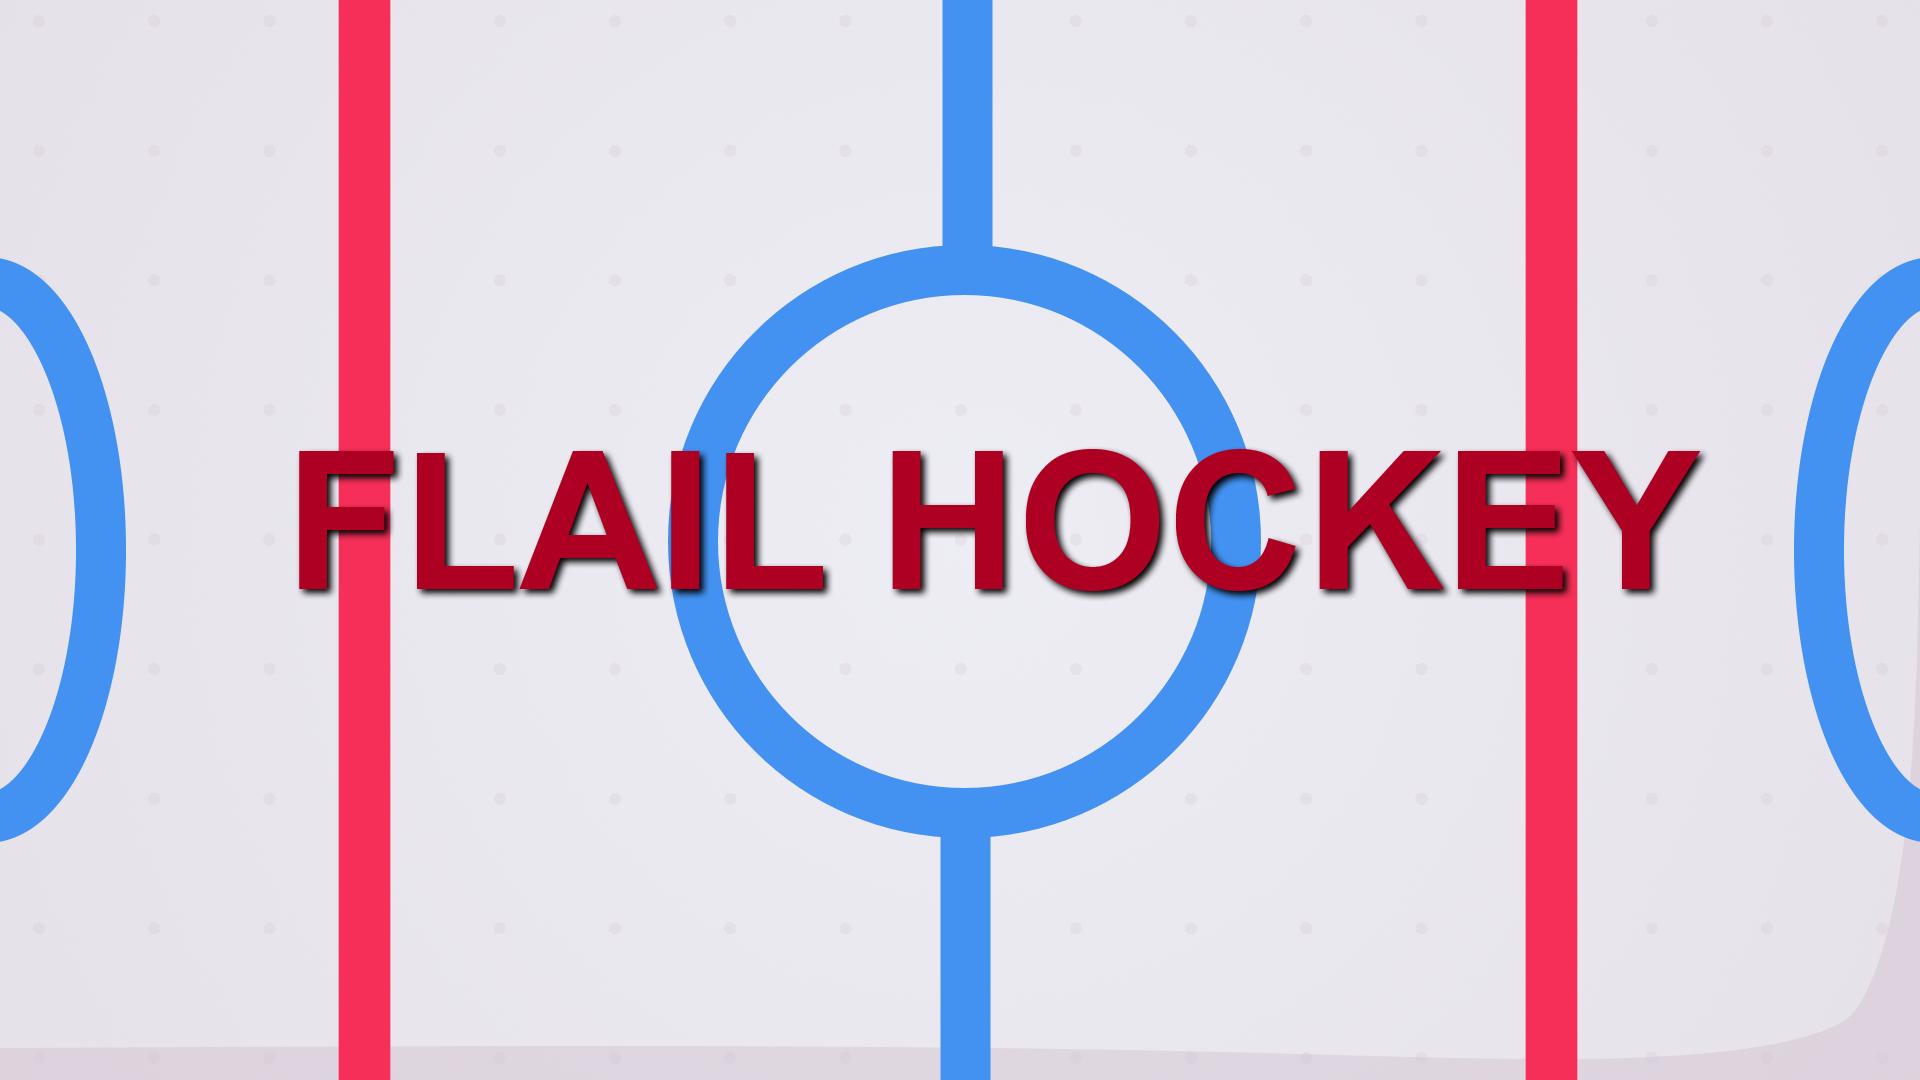 Flail Hockey